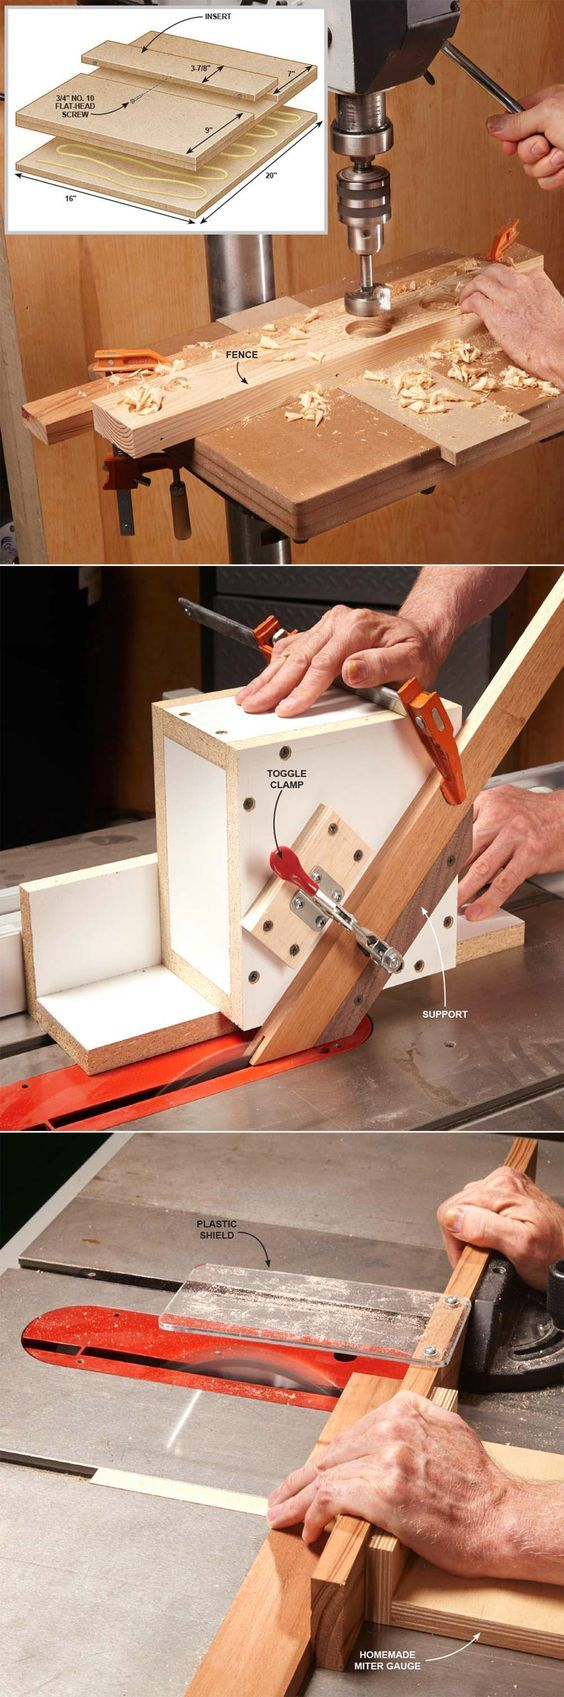 pingl par micka l plantard sur les bricoles de micka pinterest atelier de menuiserie. Black Bedroom Furniture Sets. Home Design Ideas